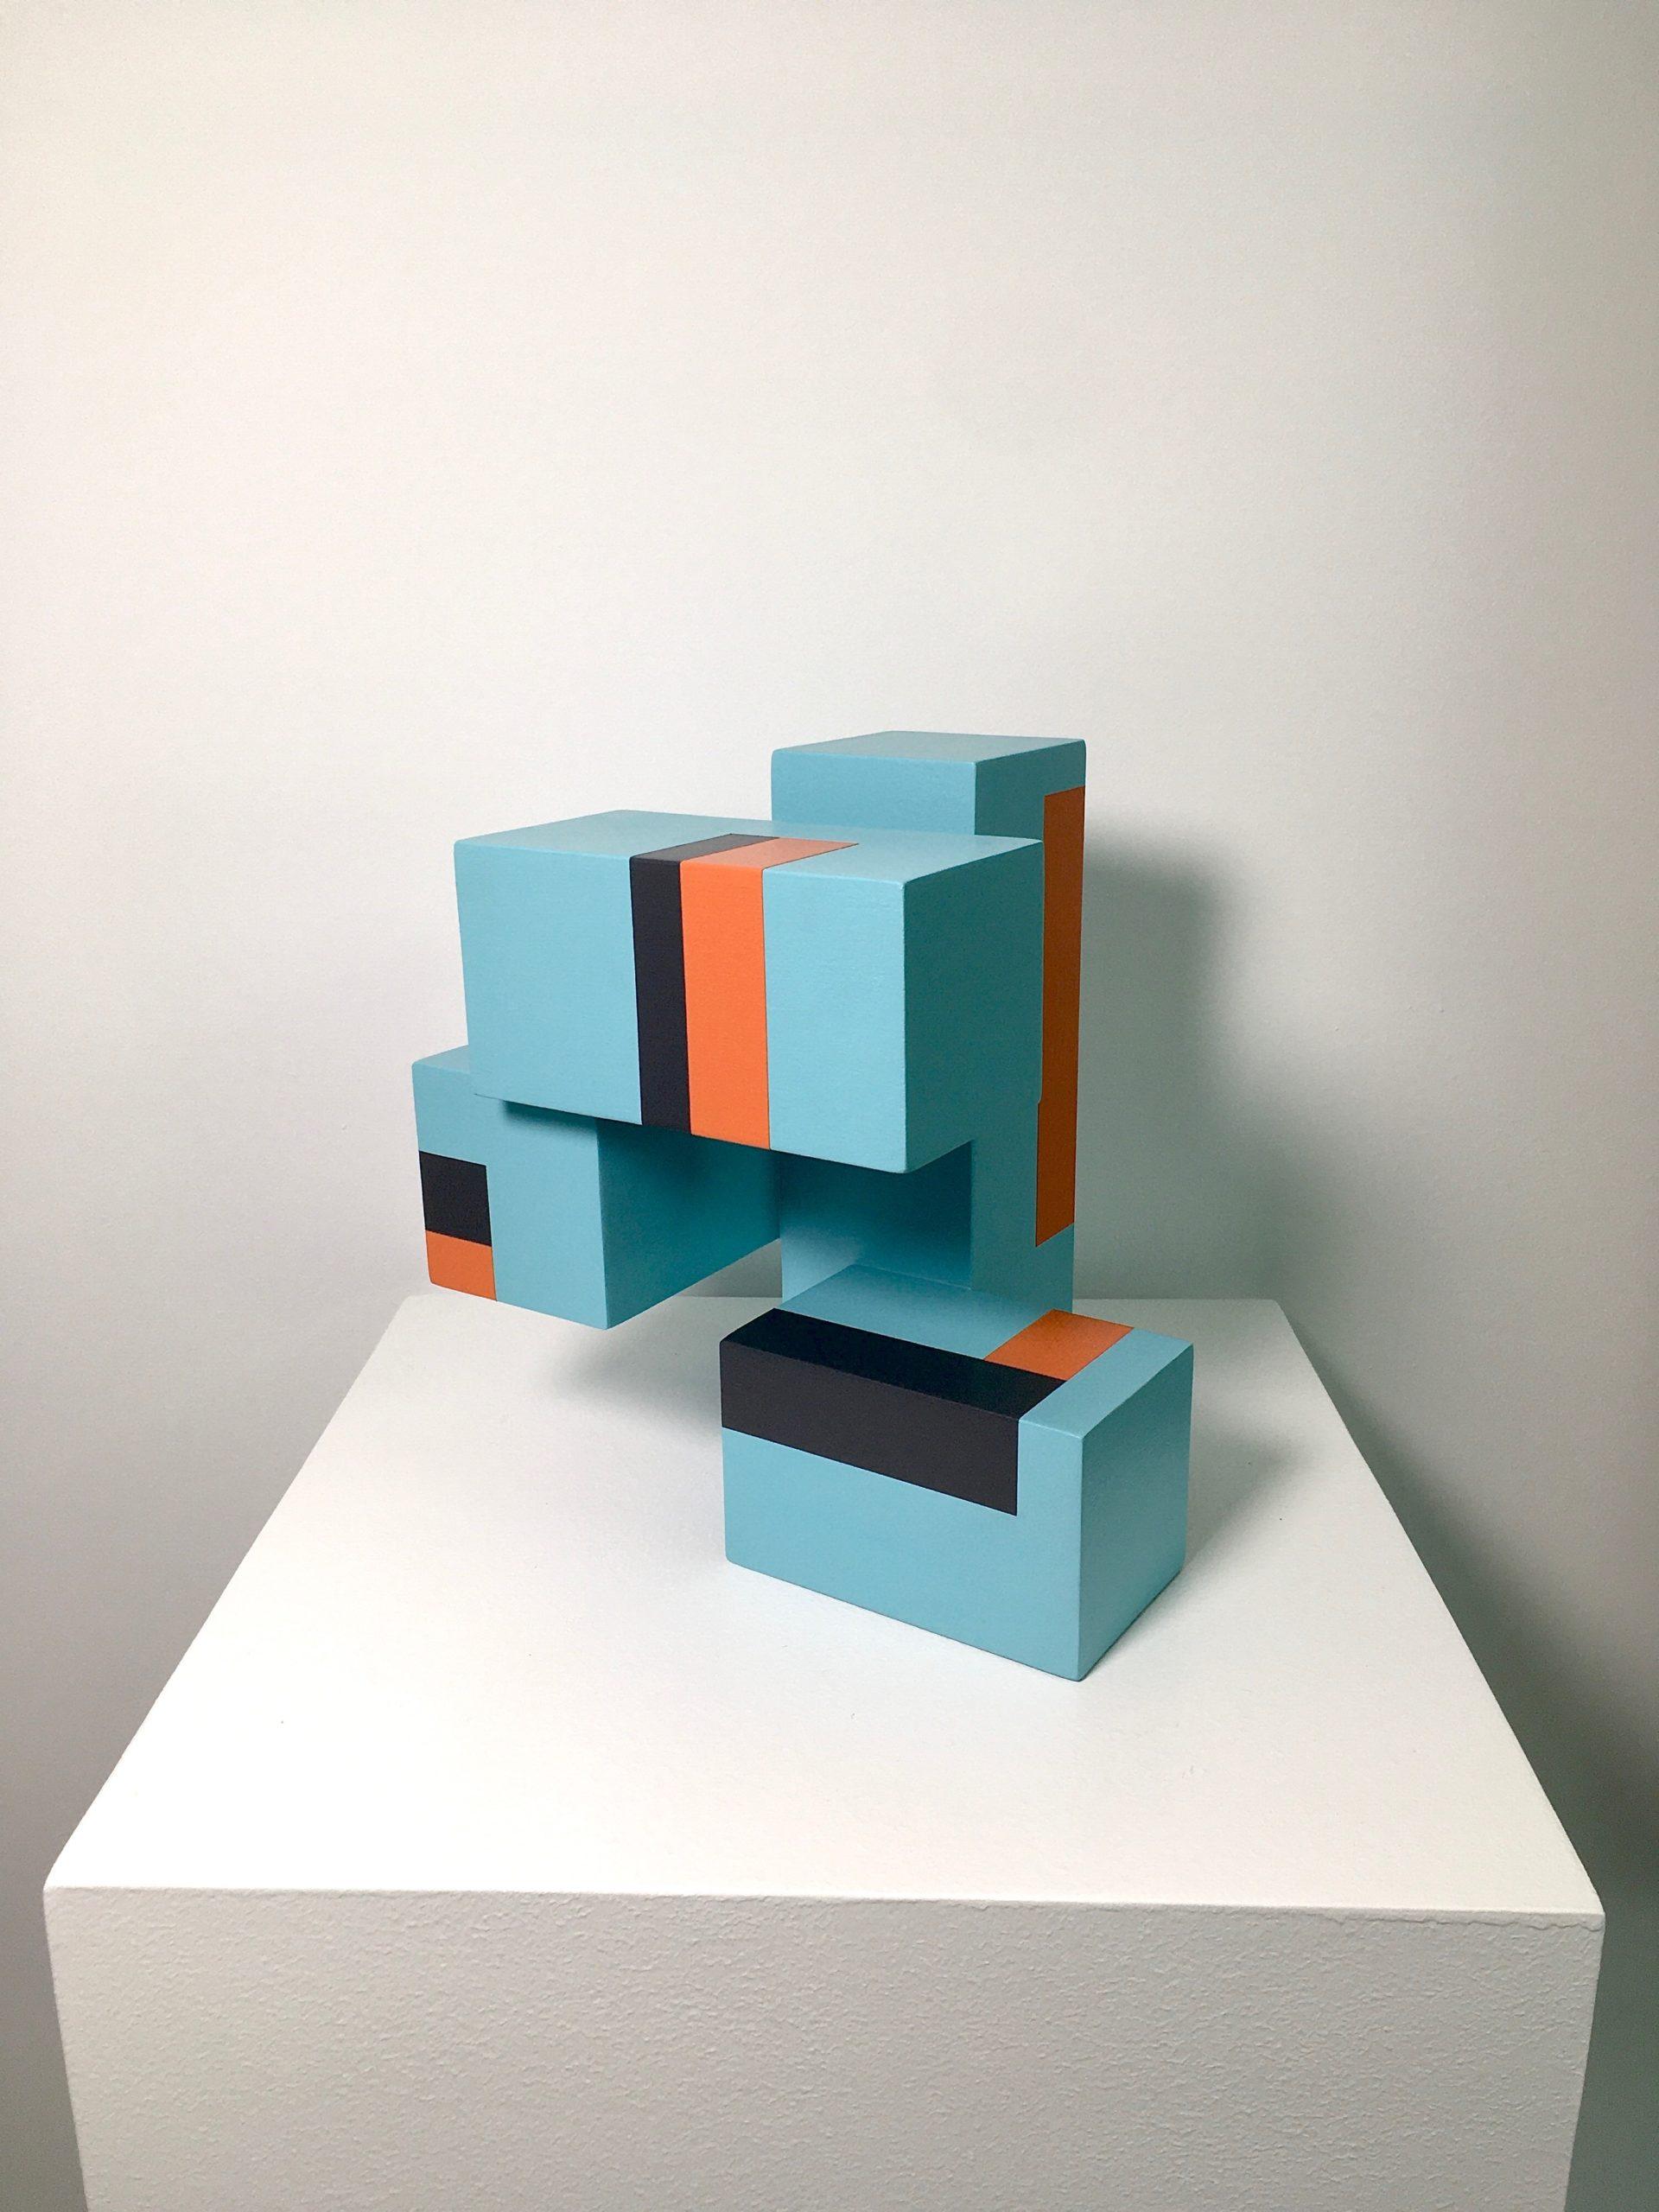 Chris Kelly's sculpture